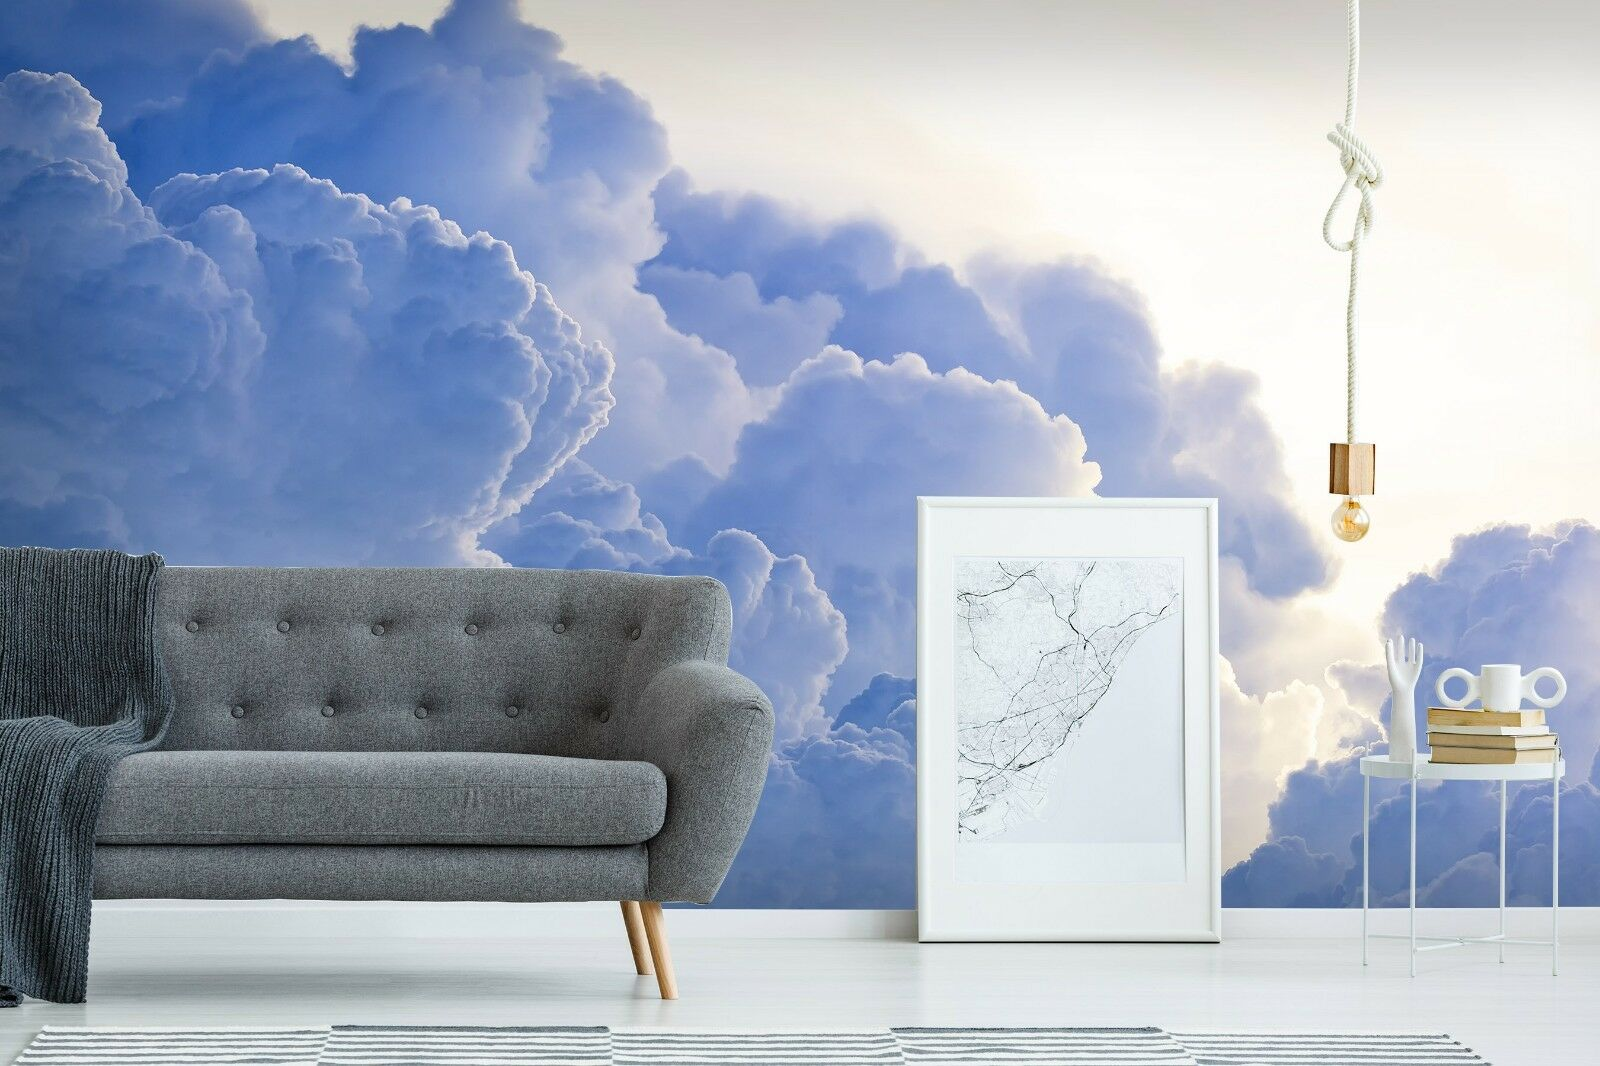 3D Dark Clouds Smoke 4 Wall Paper Wall Print Decal Wall Deco Indoor Wall Murals